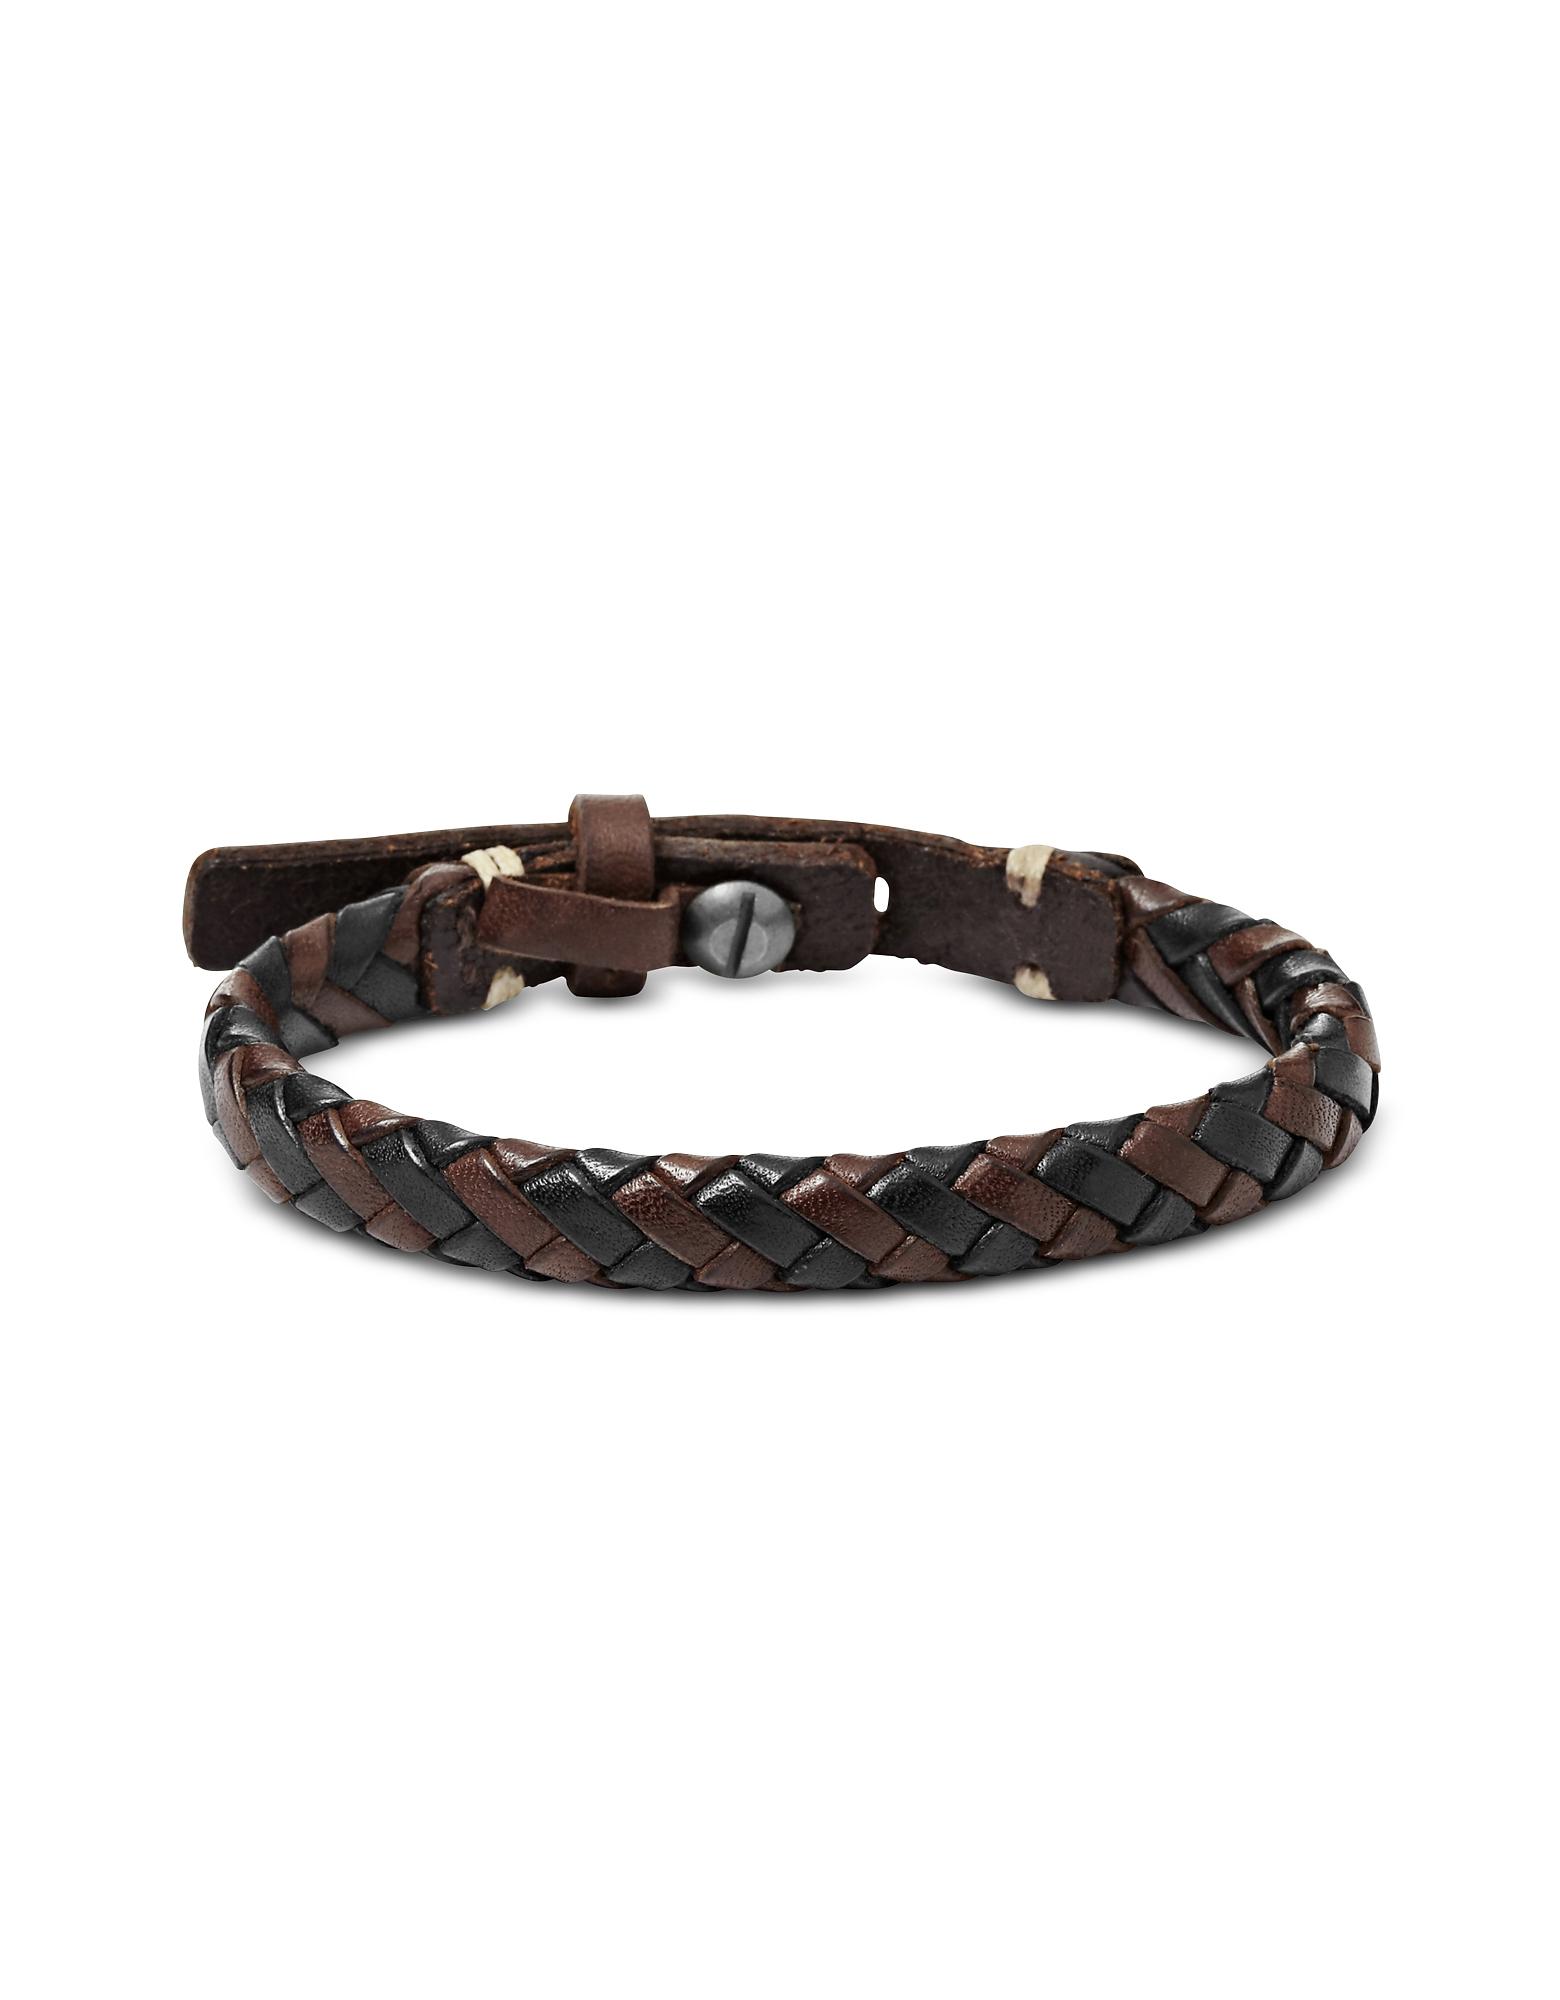 Black and Brown Braided Men's Bracelet